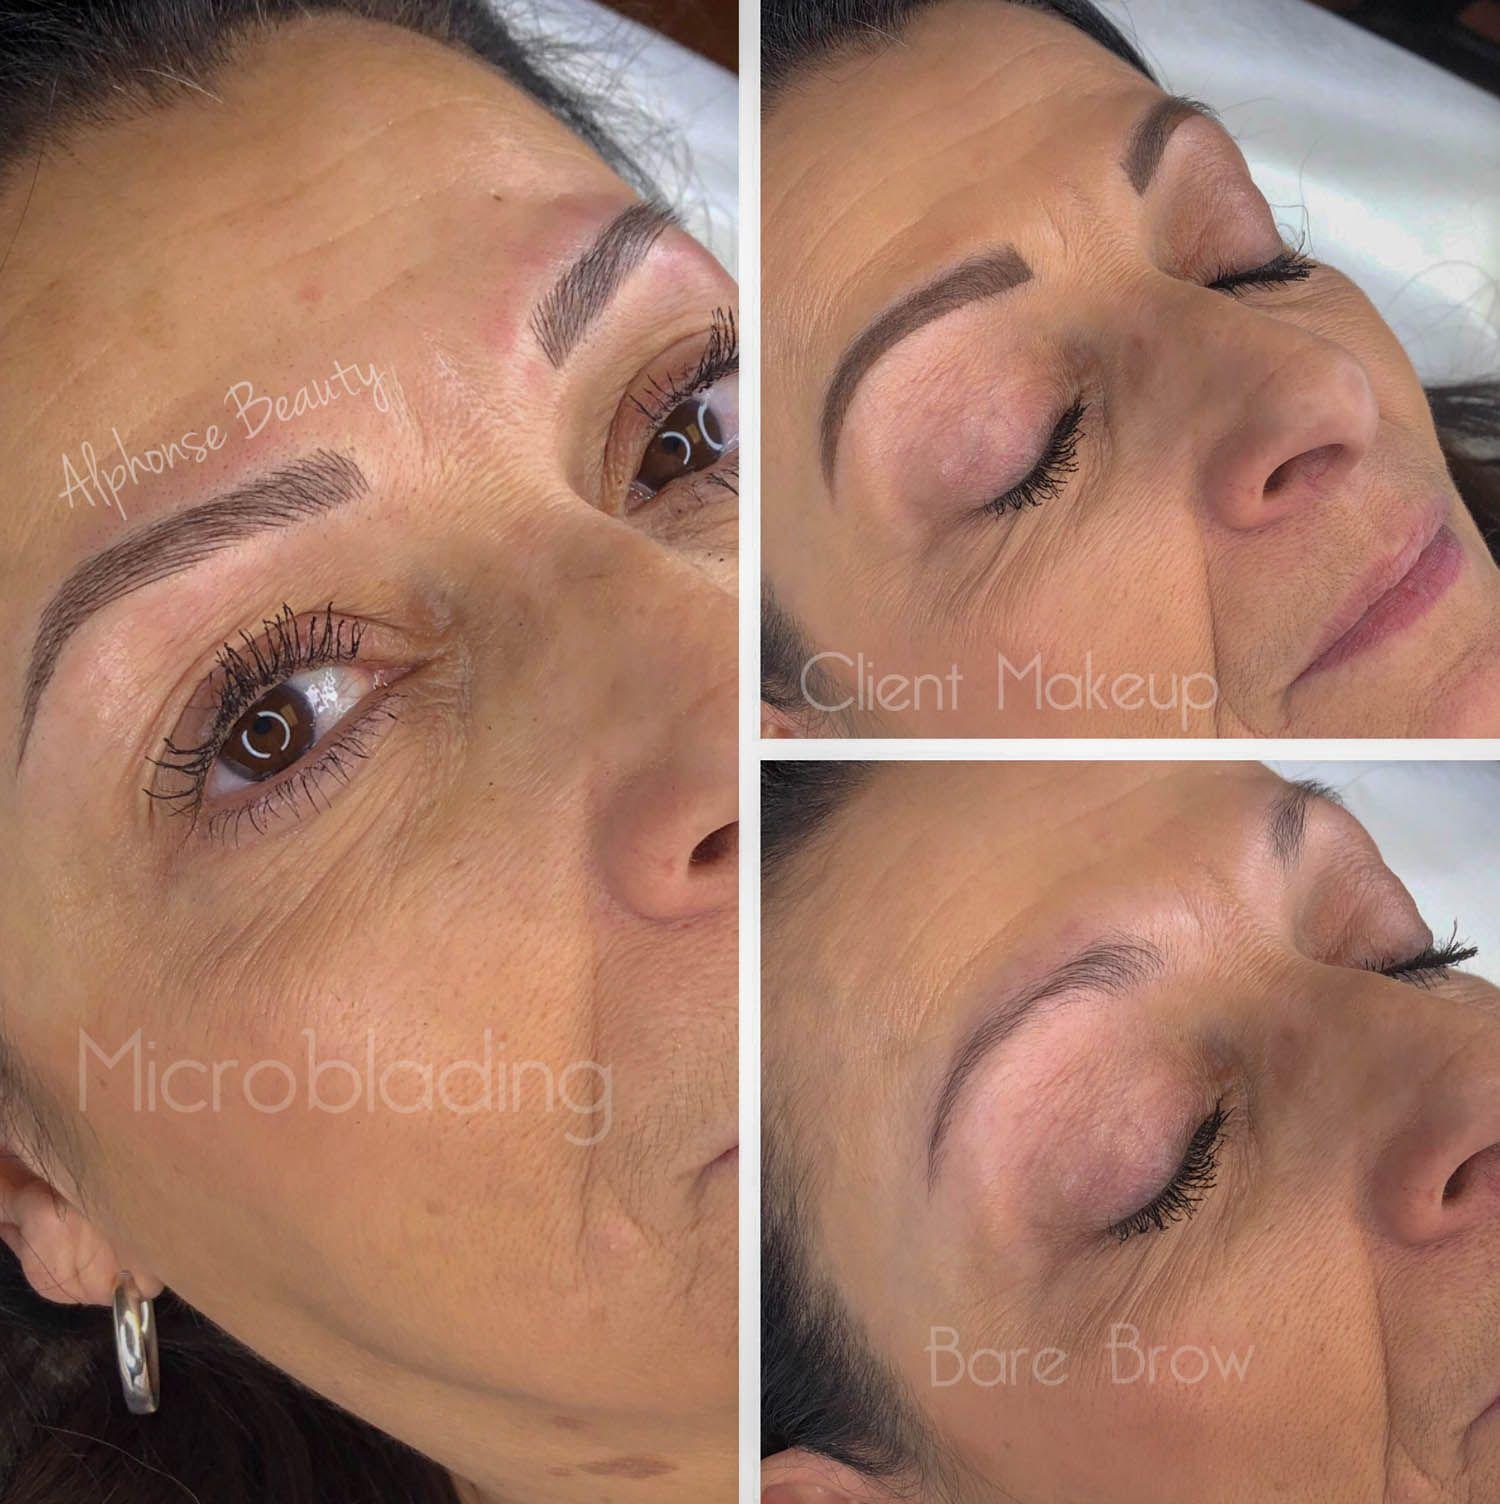 Eyebrows are more natural than makeup using Microblading